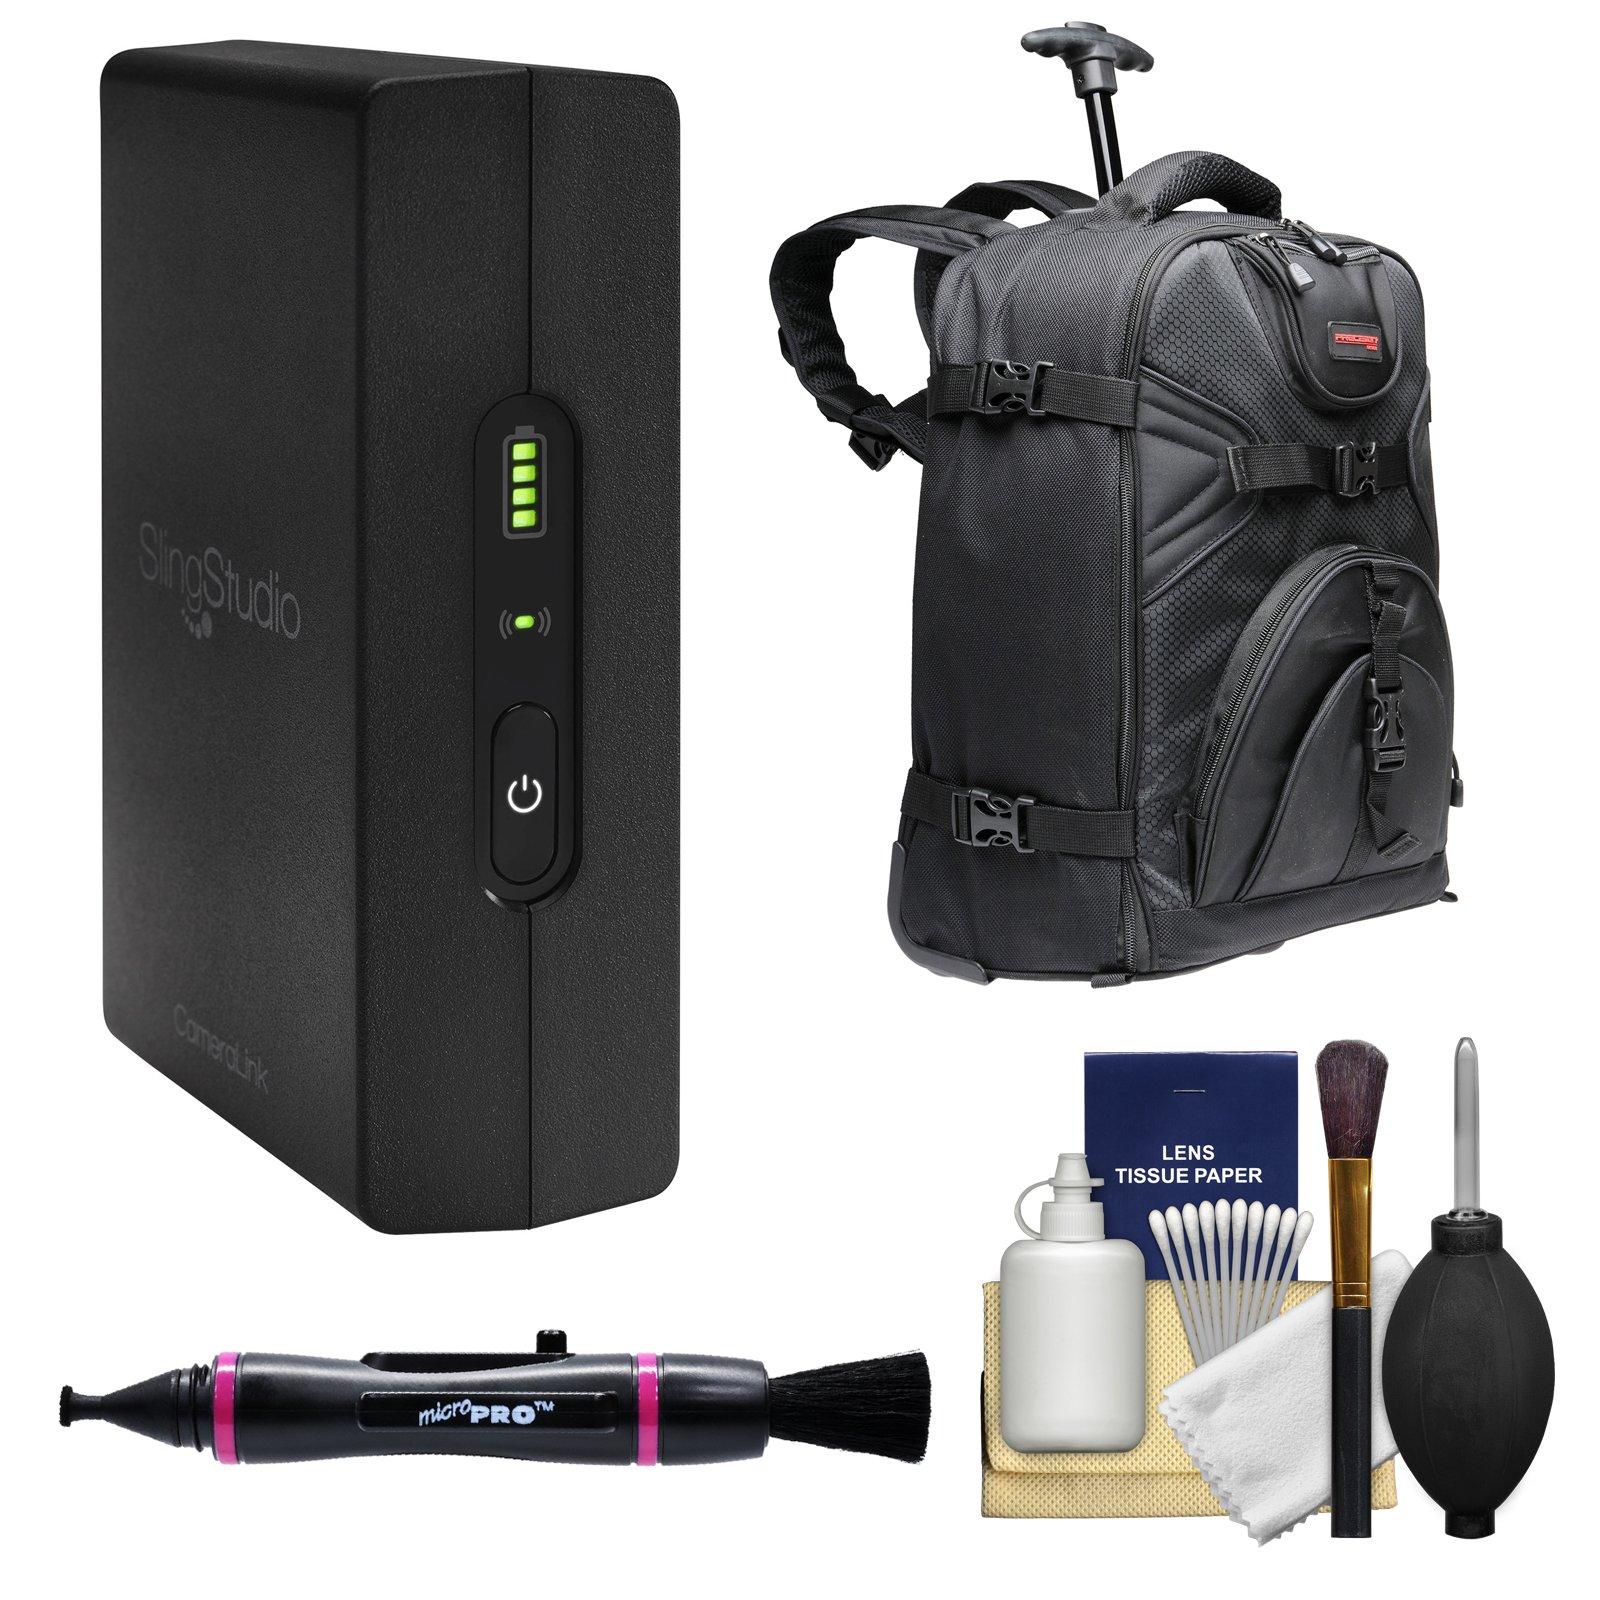 SlingStudio Wireless CameraLink with Backpack + Lenspen + Cleaning Kit